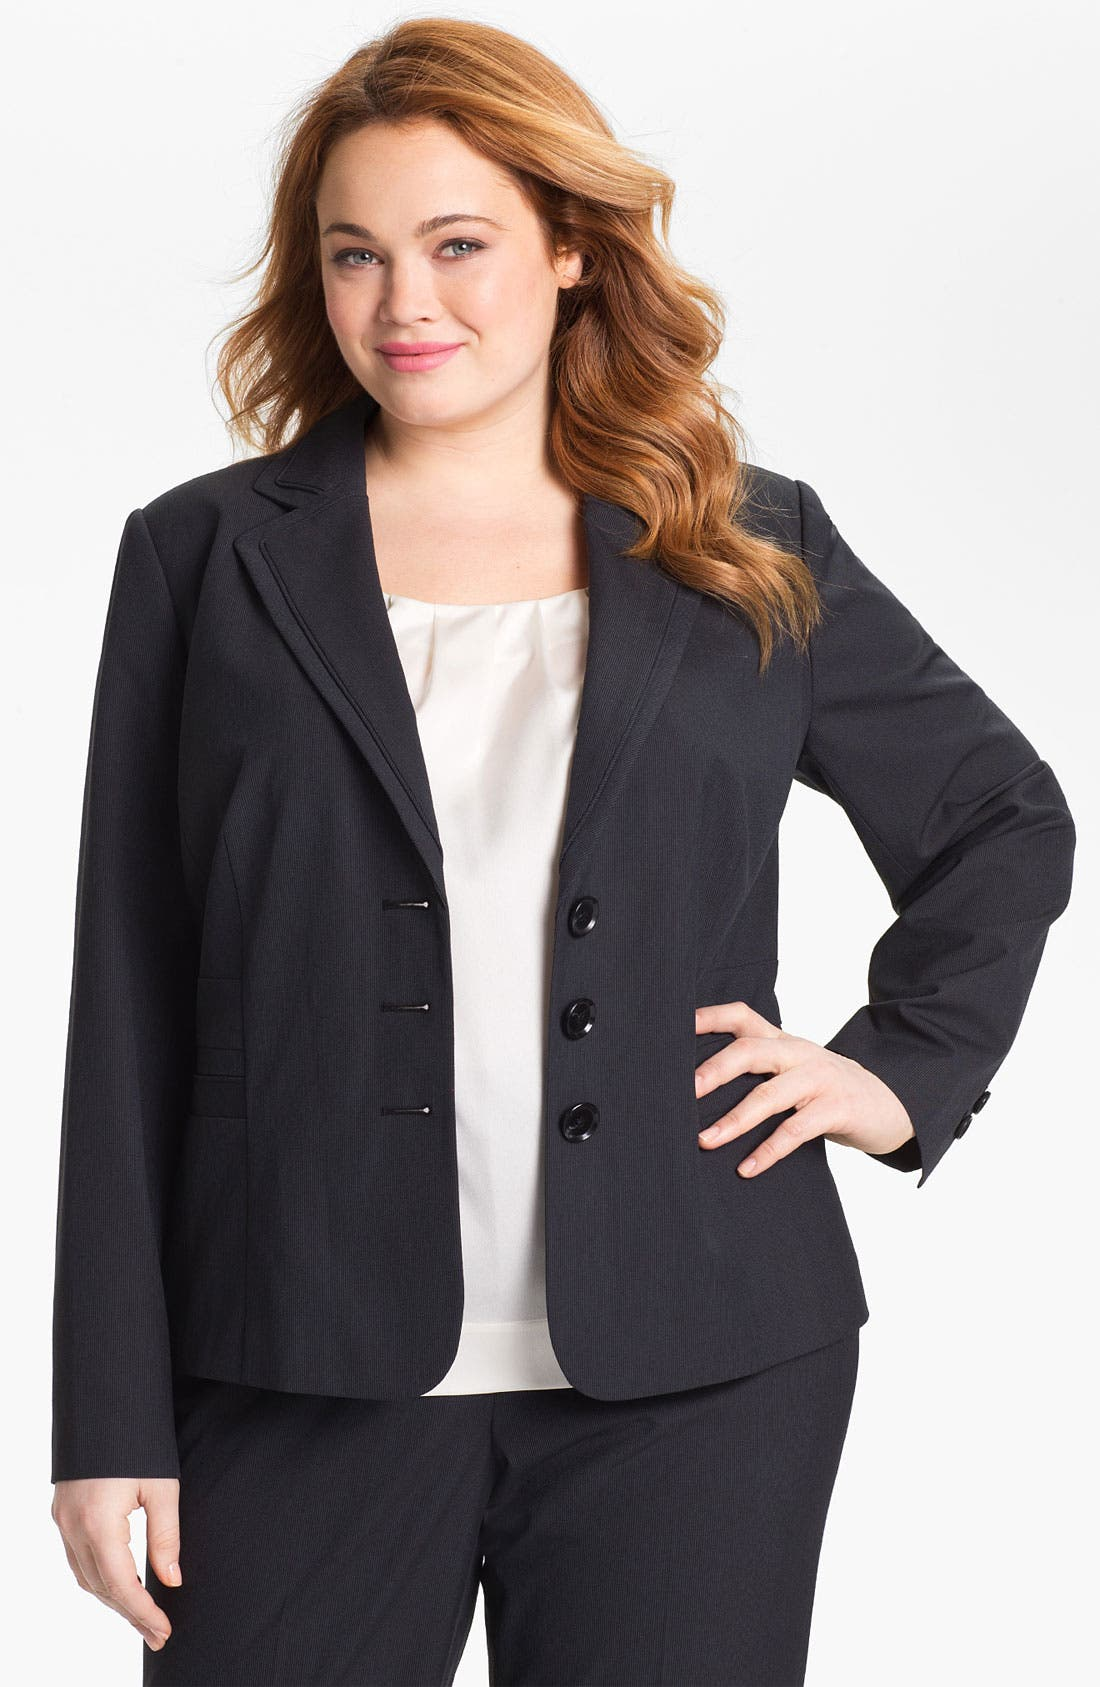 Alternate Image 1 Selected - Sejour 'Boardwalk' Suit Jacket (Plus Size)